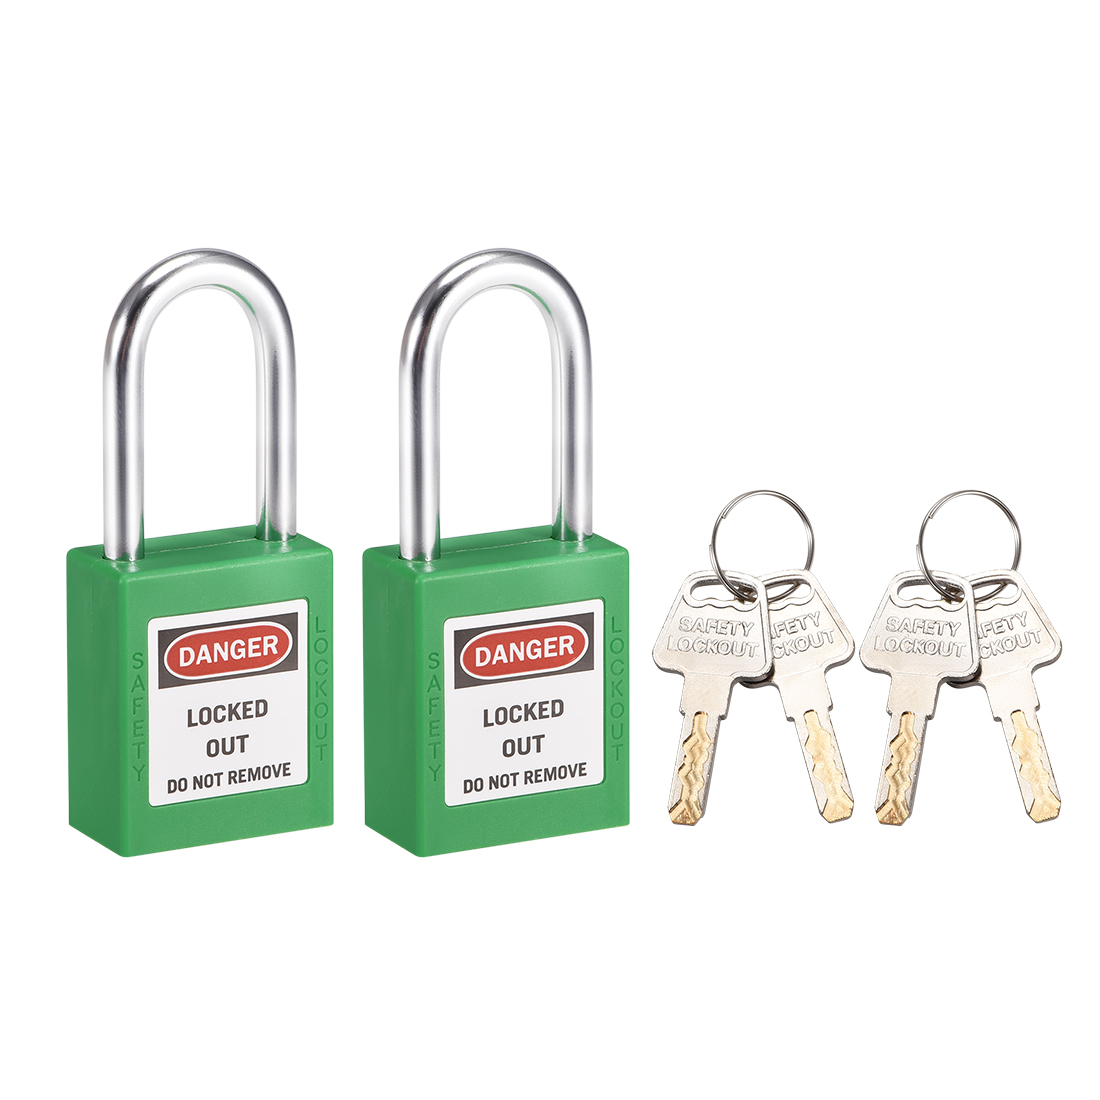 Lockout Tagout Locks 1-1/2 Inch Shackle Key Different Padlock Grass Green 2 Pcs